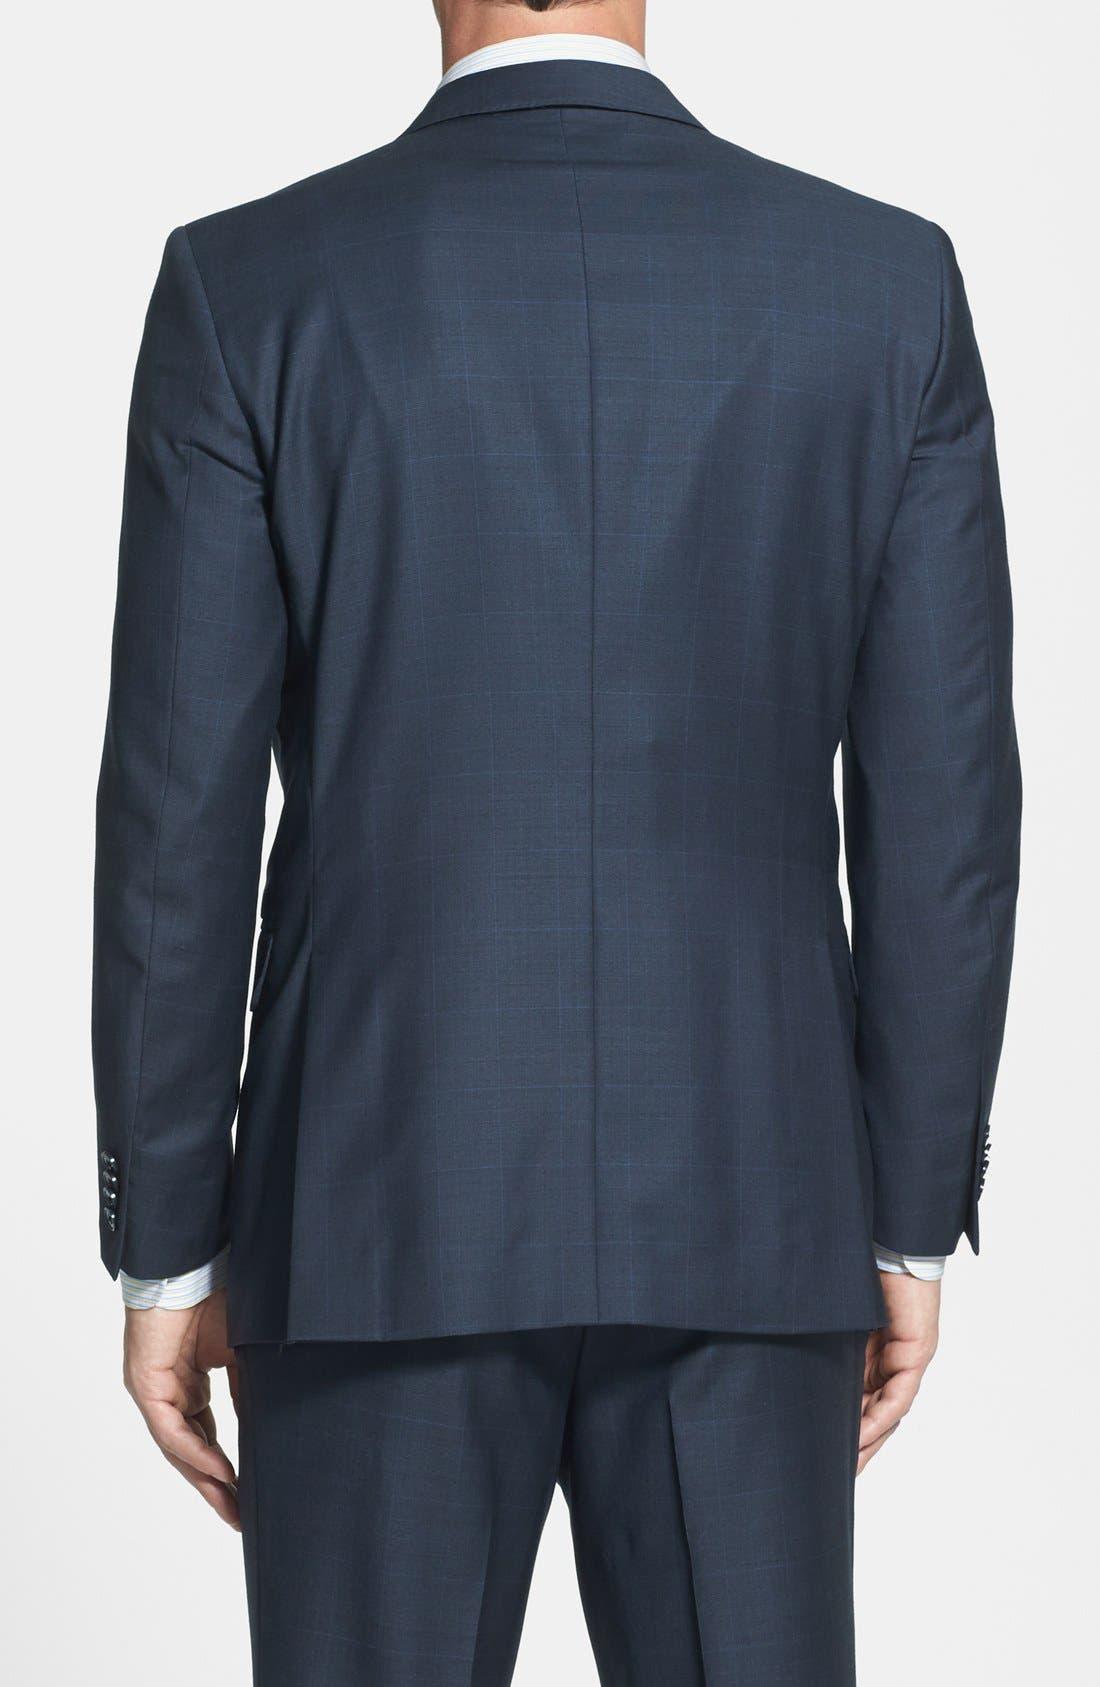 PETER MILLAR,                             Classic Fit Navy Windowpane Suit,                             Alternate thumbnail 5, color,                             410